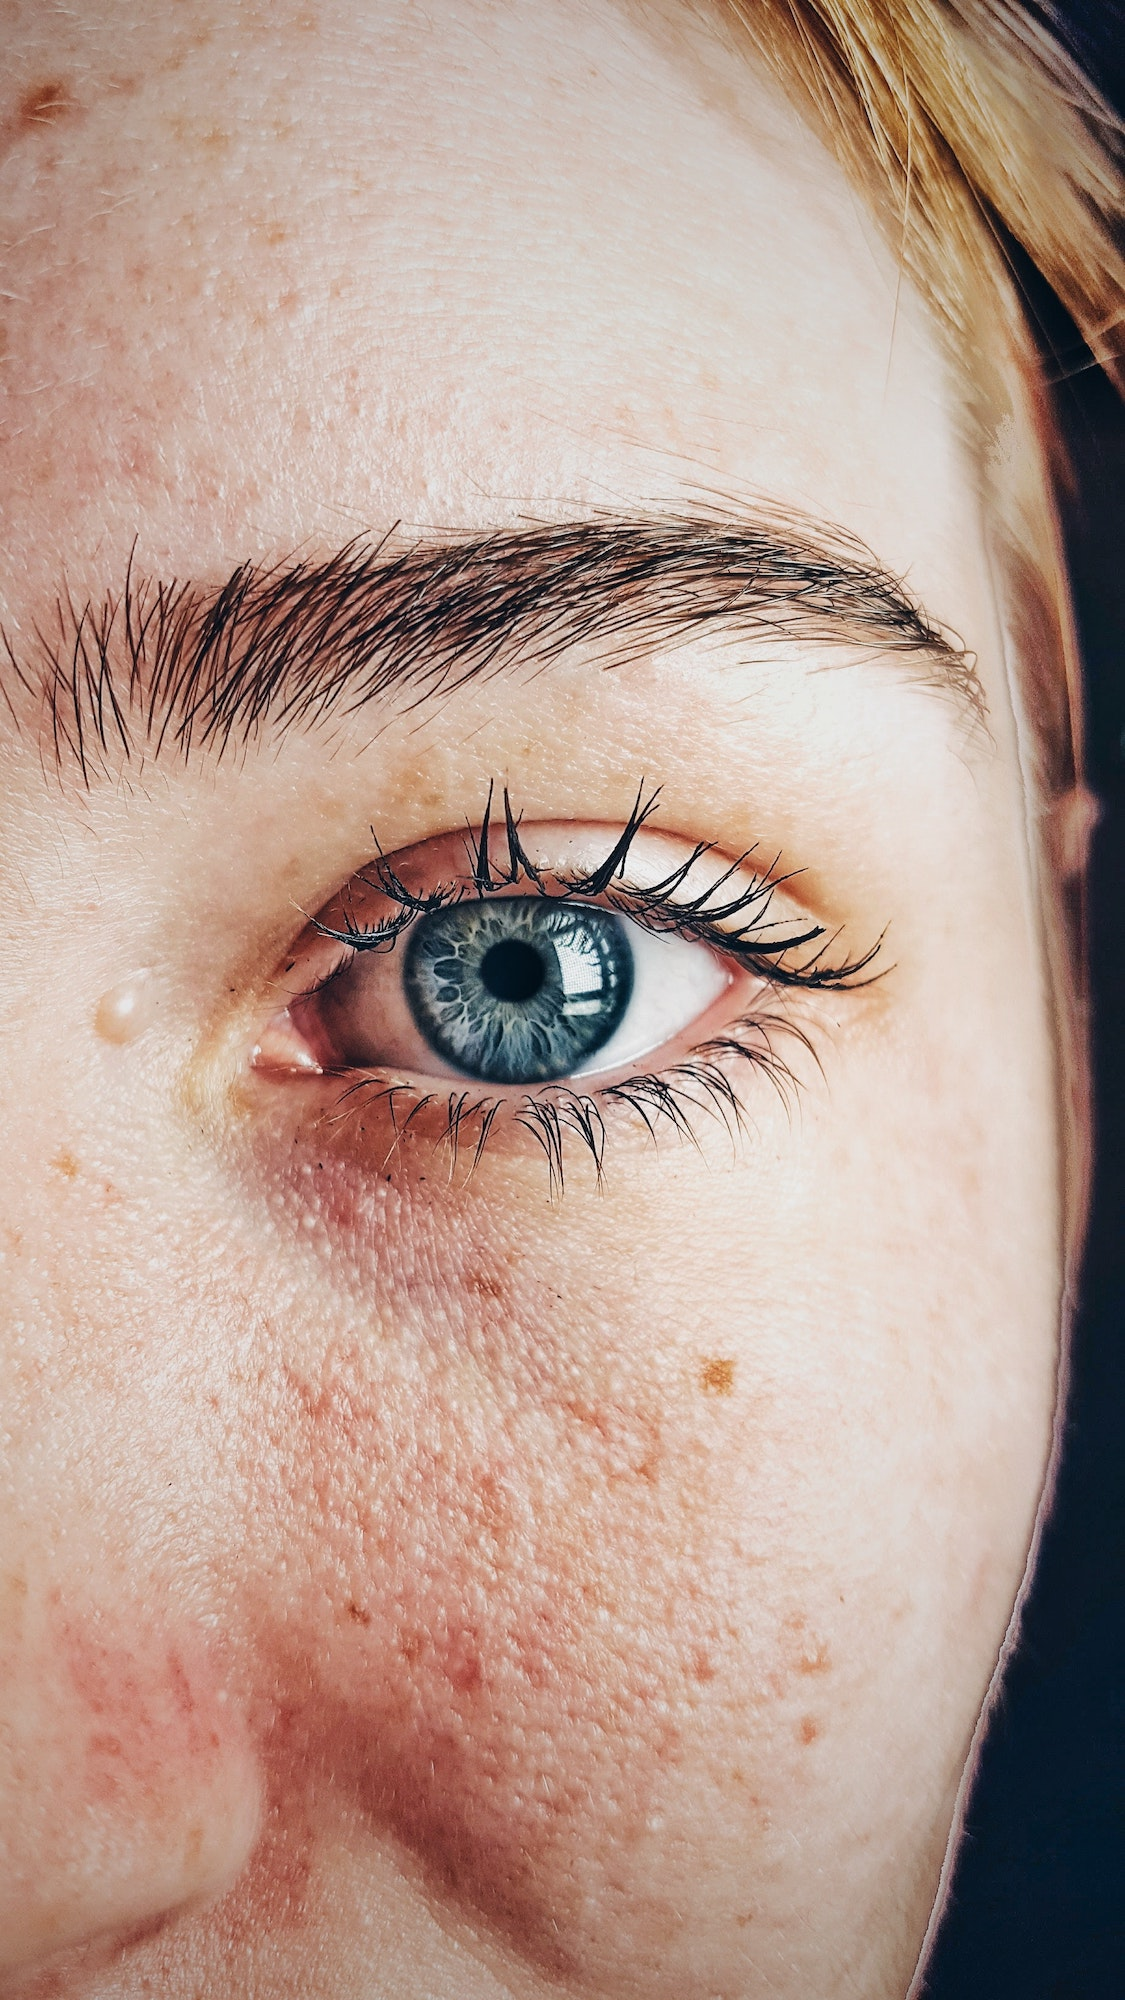 Acne Breakouts - 5 Ways Hormones Affect Your Skin | Beauty Tips | Elle Blonde Luxury Lifestyle Destination Blog